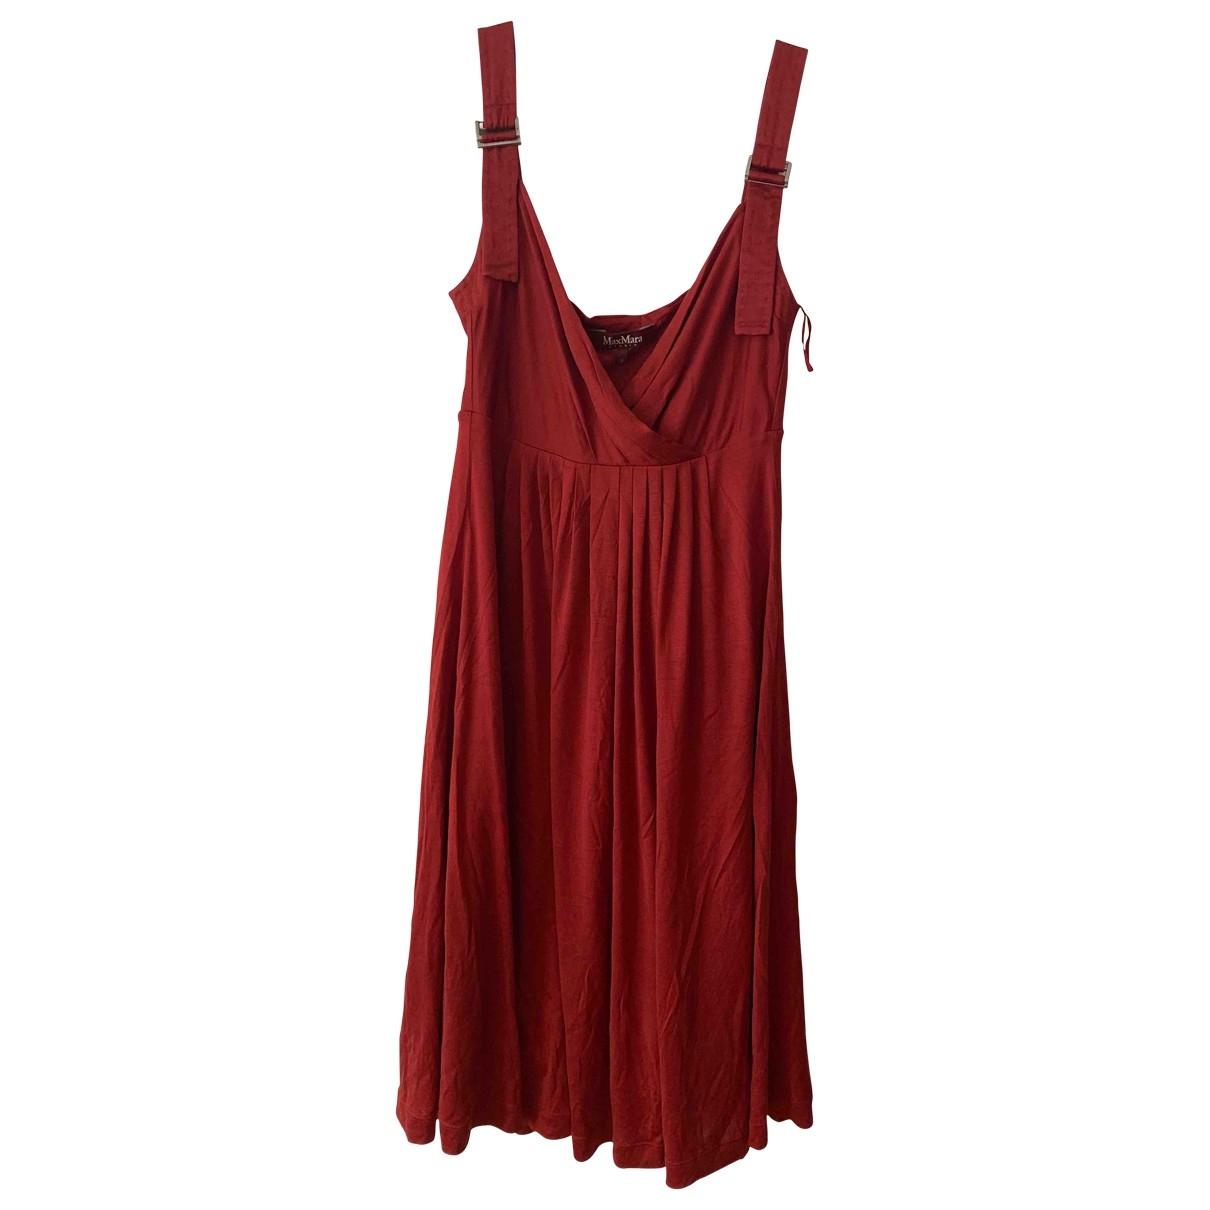 Max Mara Studio \N Red Silk dress for Women S International